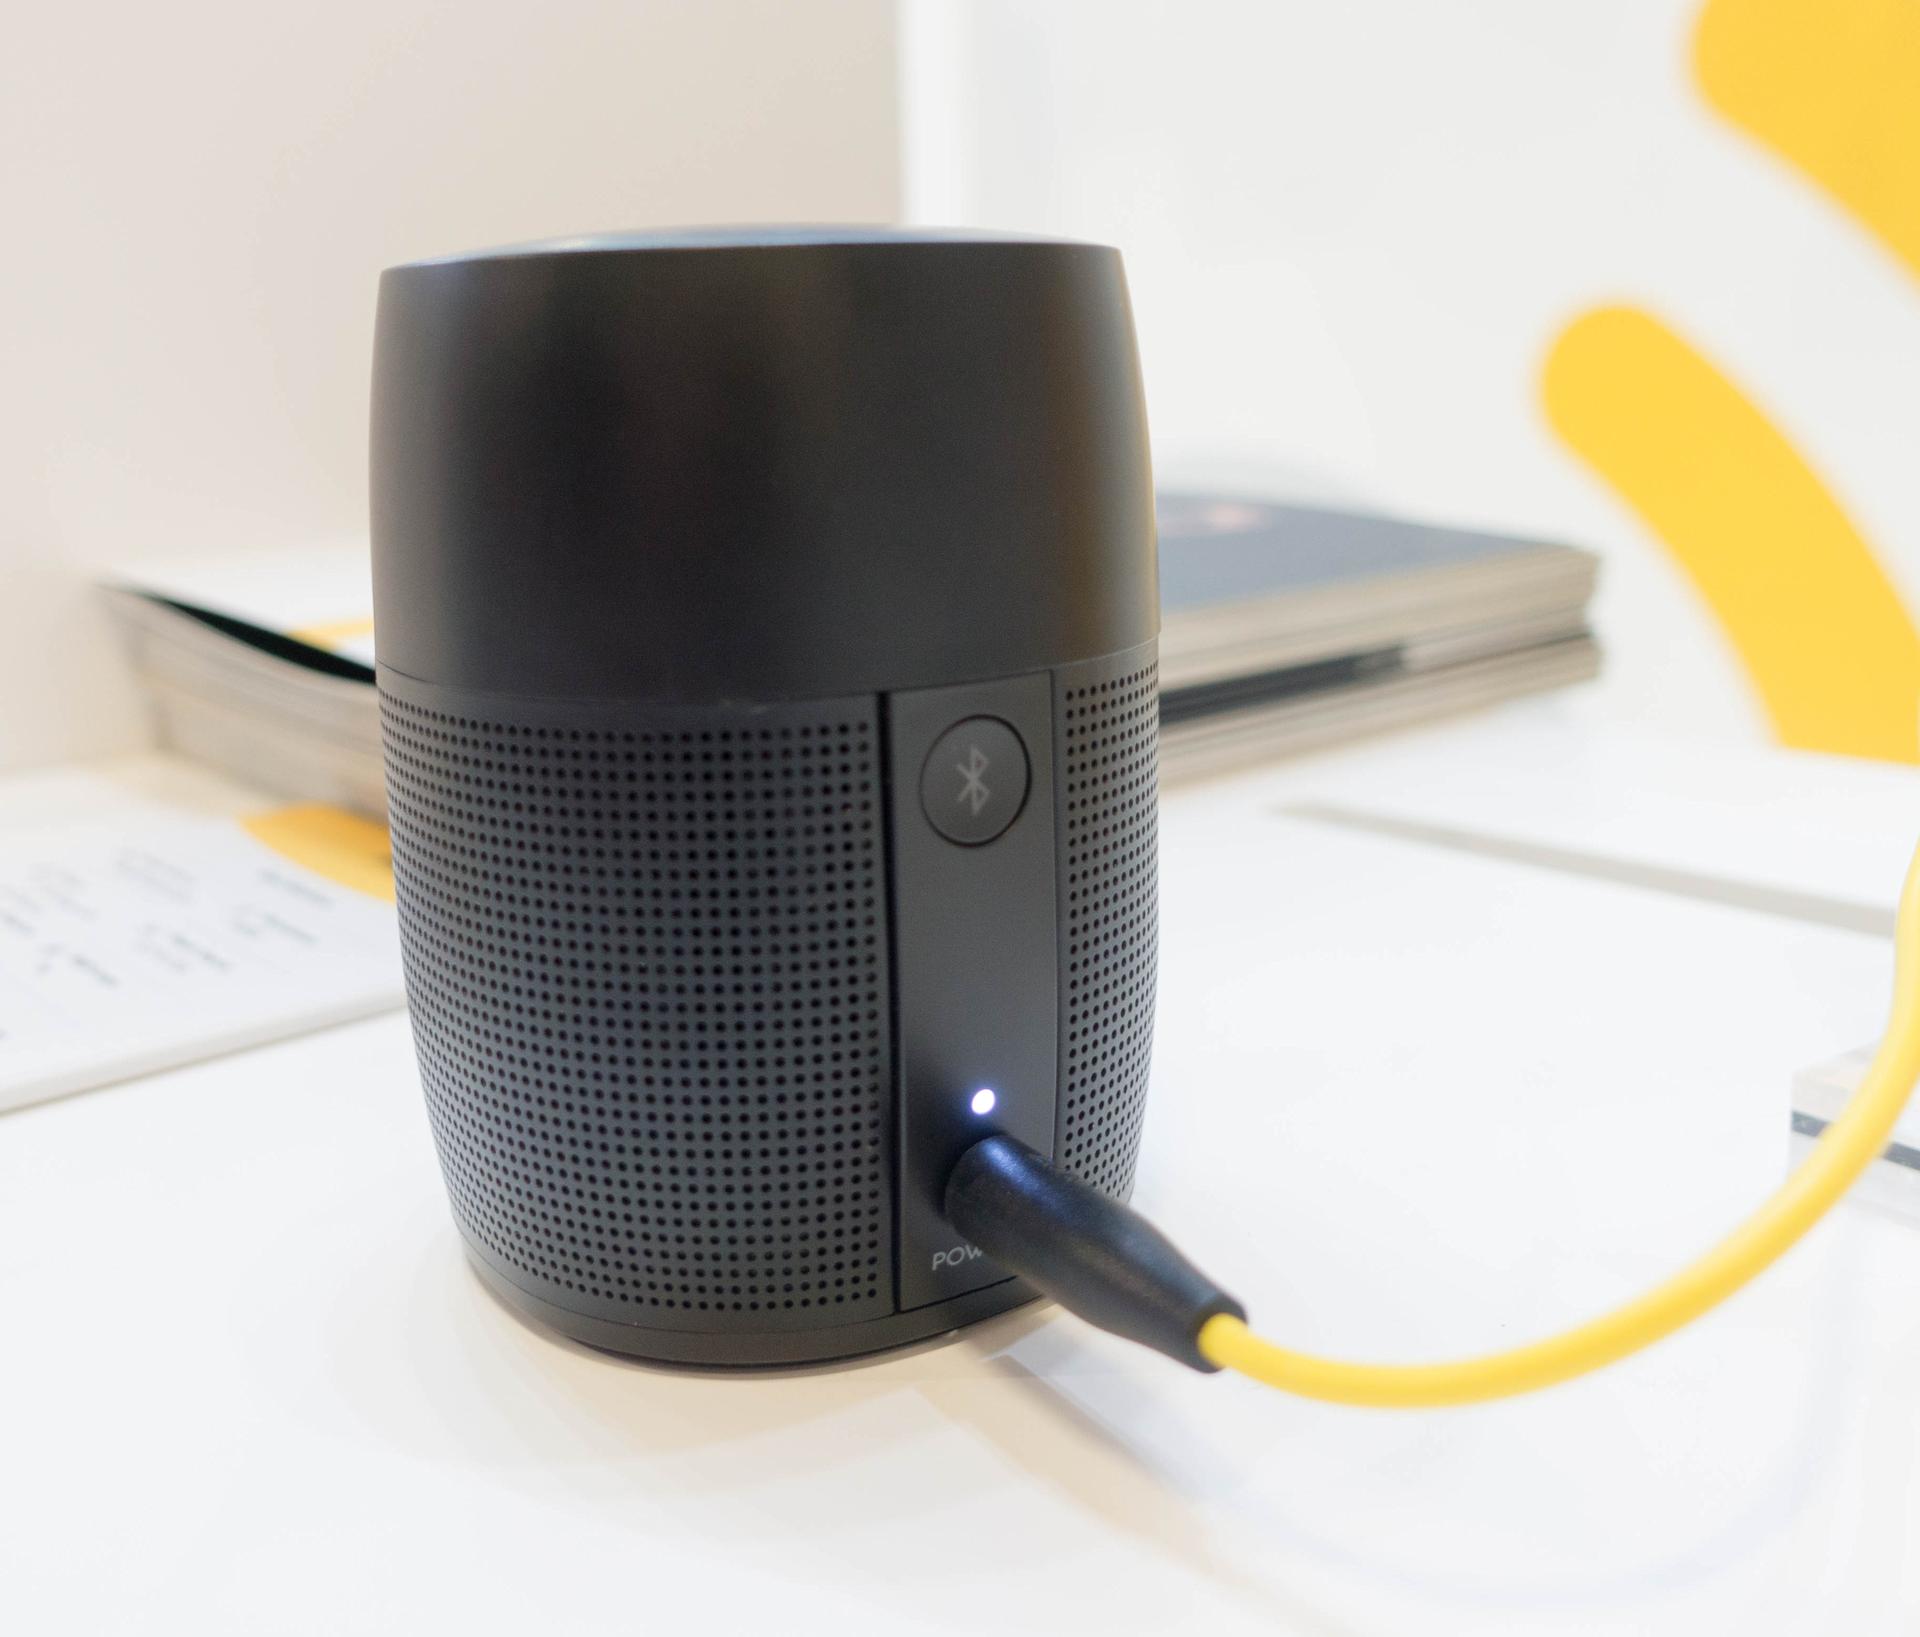 Alexa und Google Assistant: Der Wettkampf smarter Lautsprecher verändert sich - Zolo Mojo (Bild: Ingo Pakalski/Golem.de)